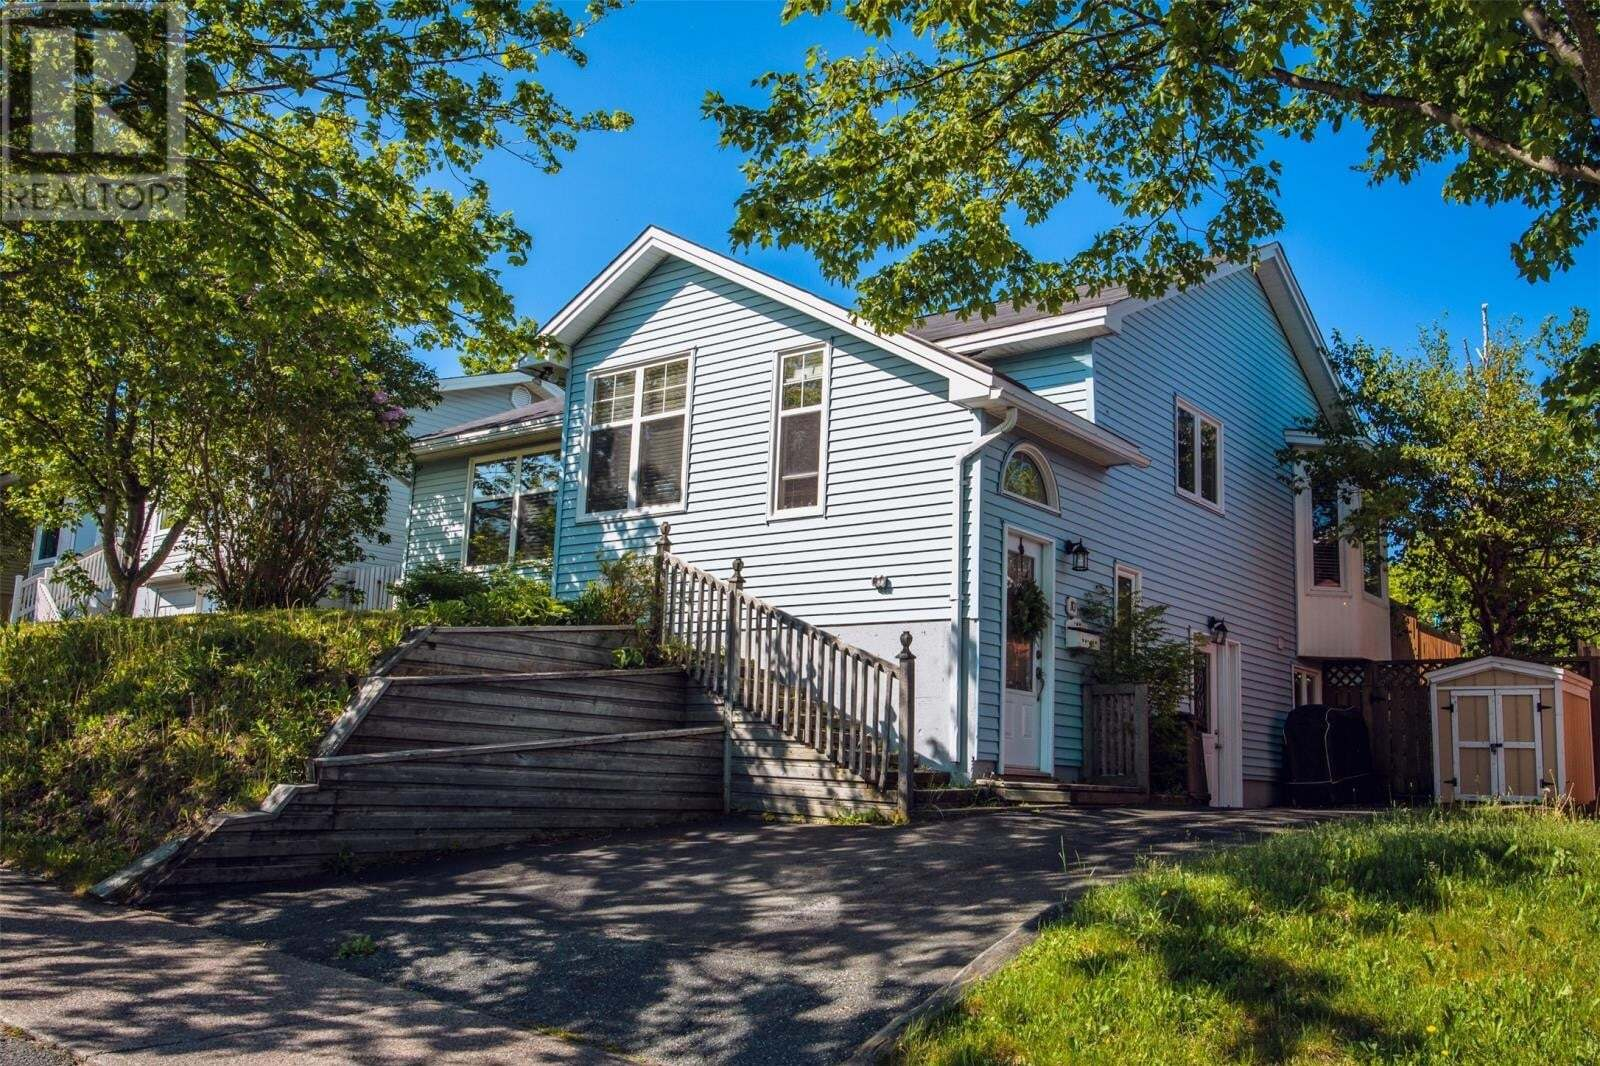 House for sale at 110 Ennis Ave St. John's Newfoundland - MLS: 1214043